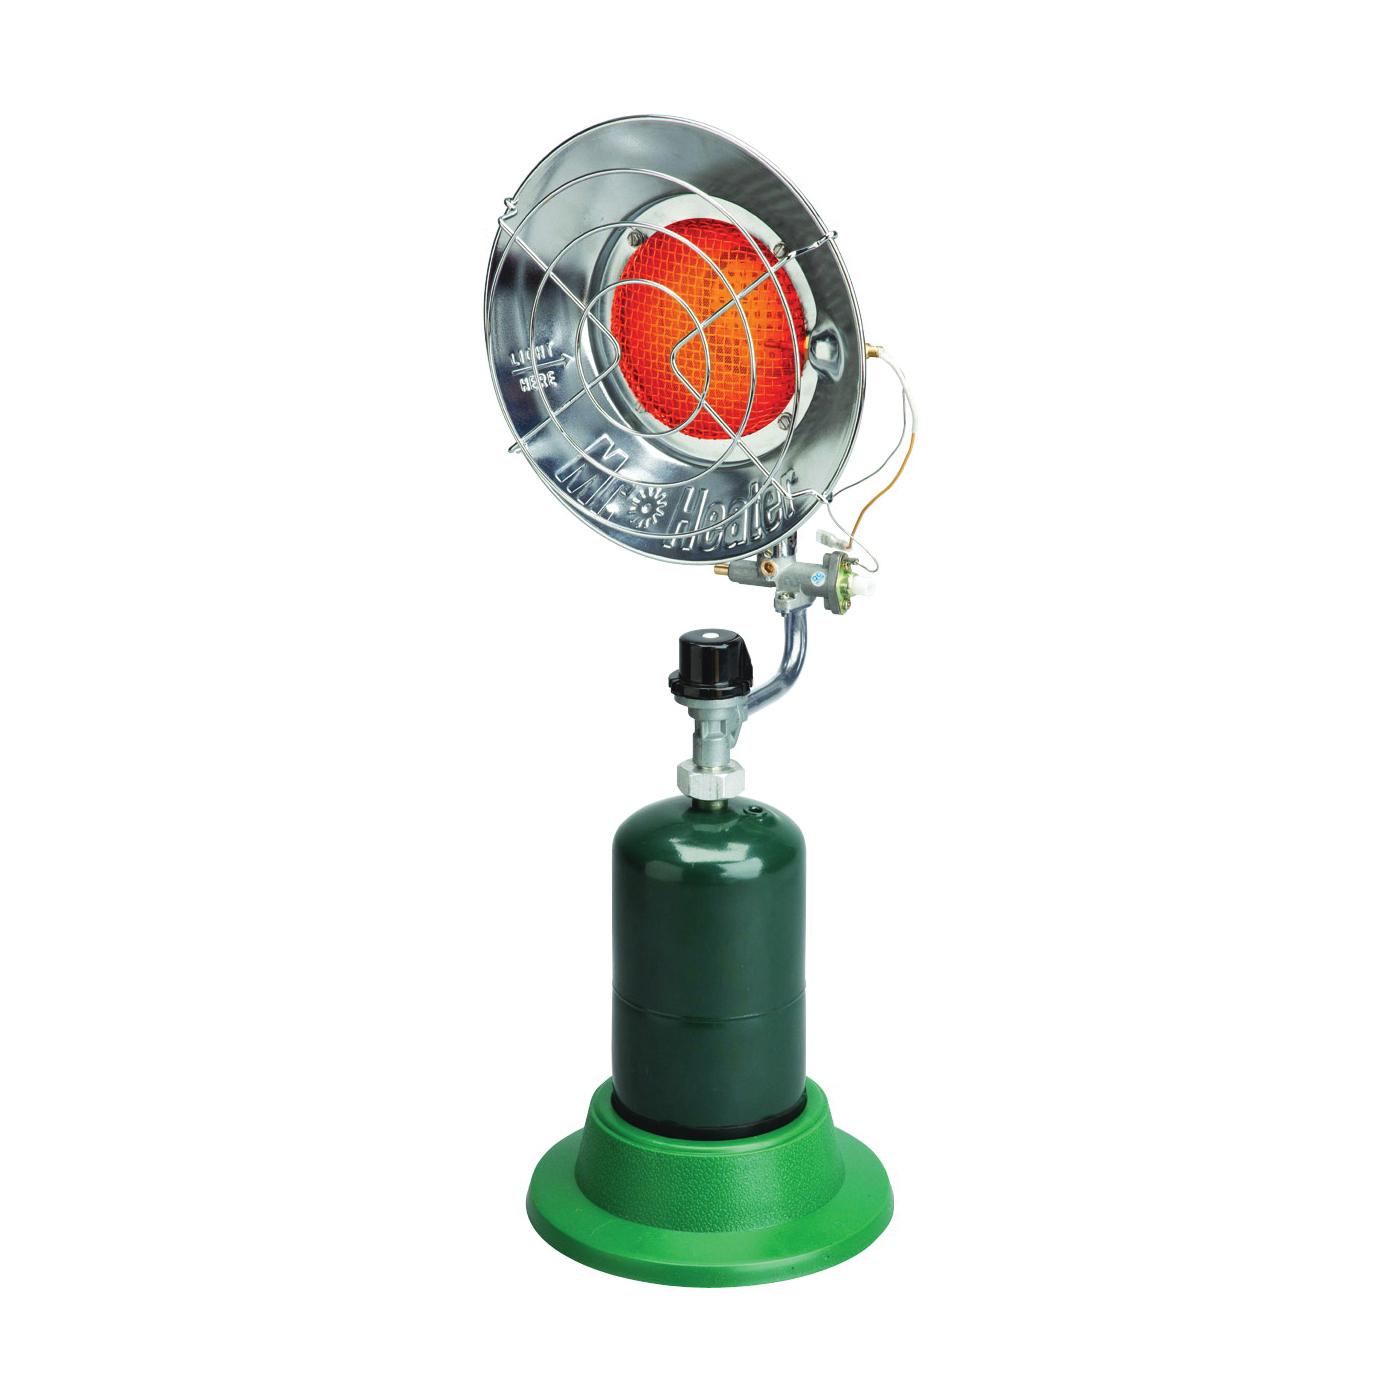 Picture of Mr. Heater F242200 Single Tank Top Heater, 8-1/4 in W, 10,000 to 15,000 Btu Heating, Propane, Metal